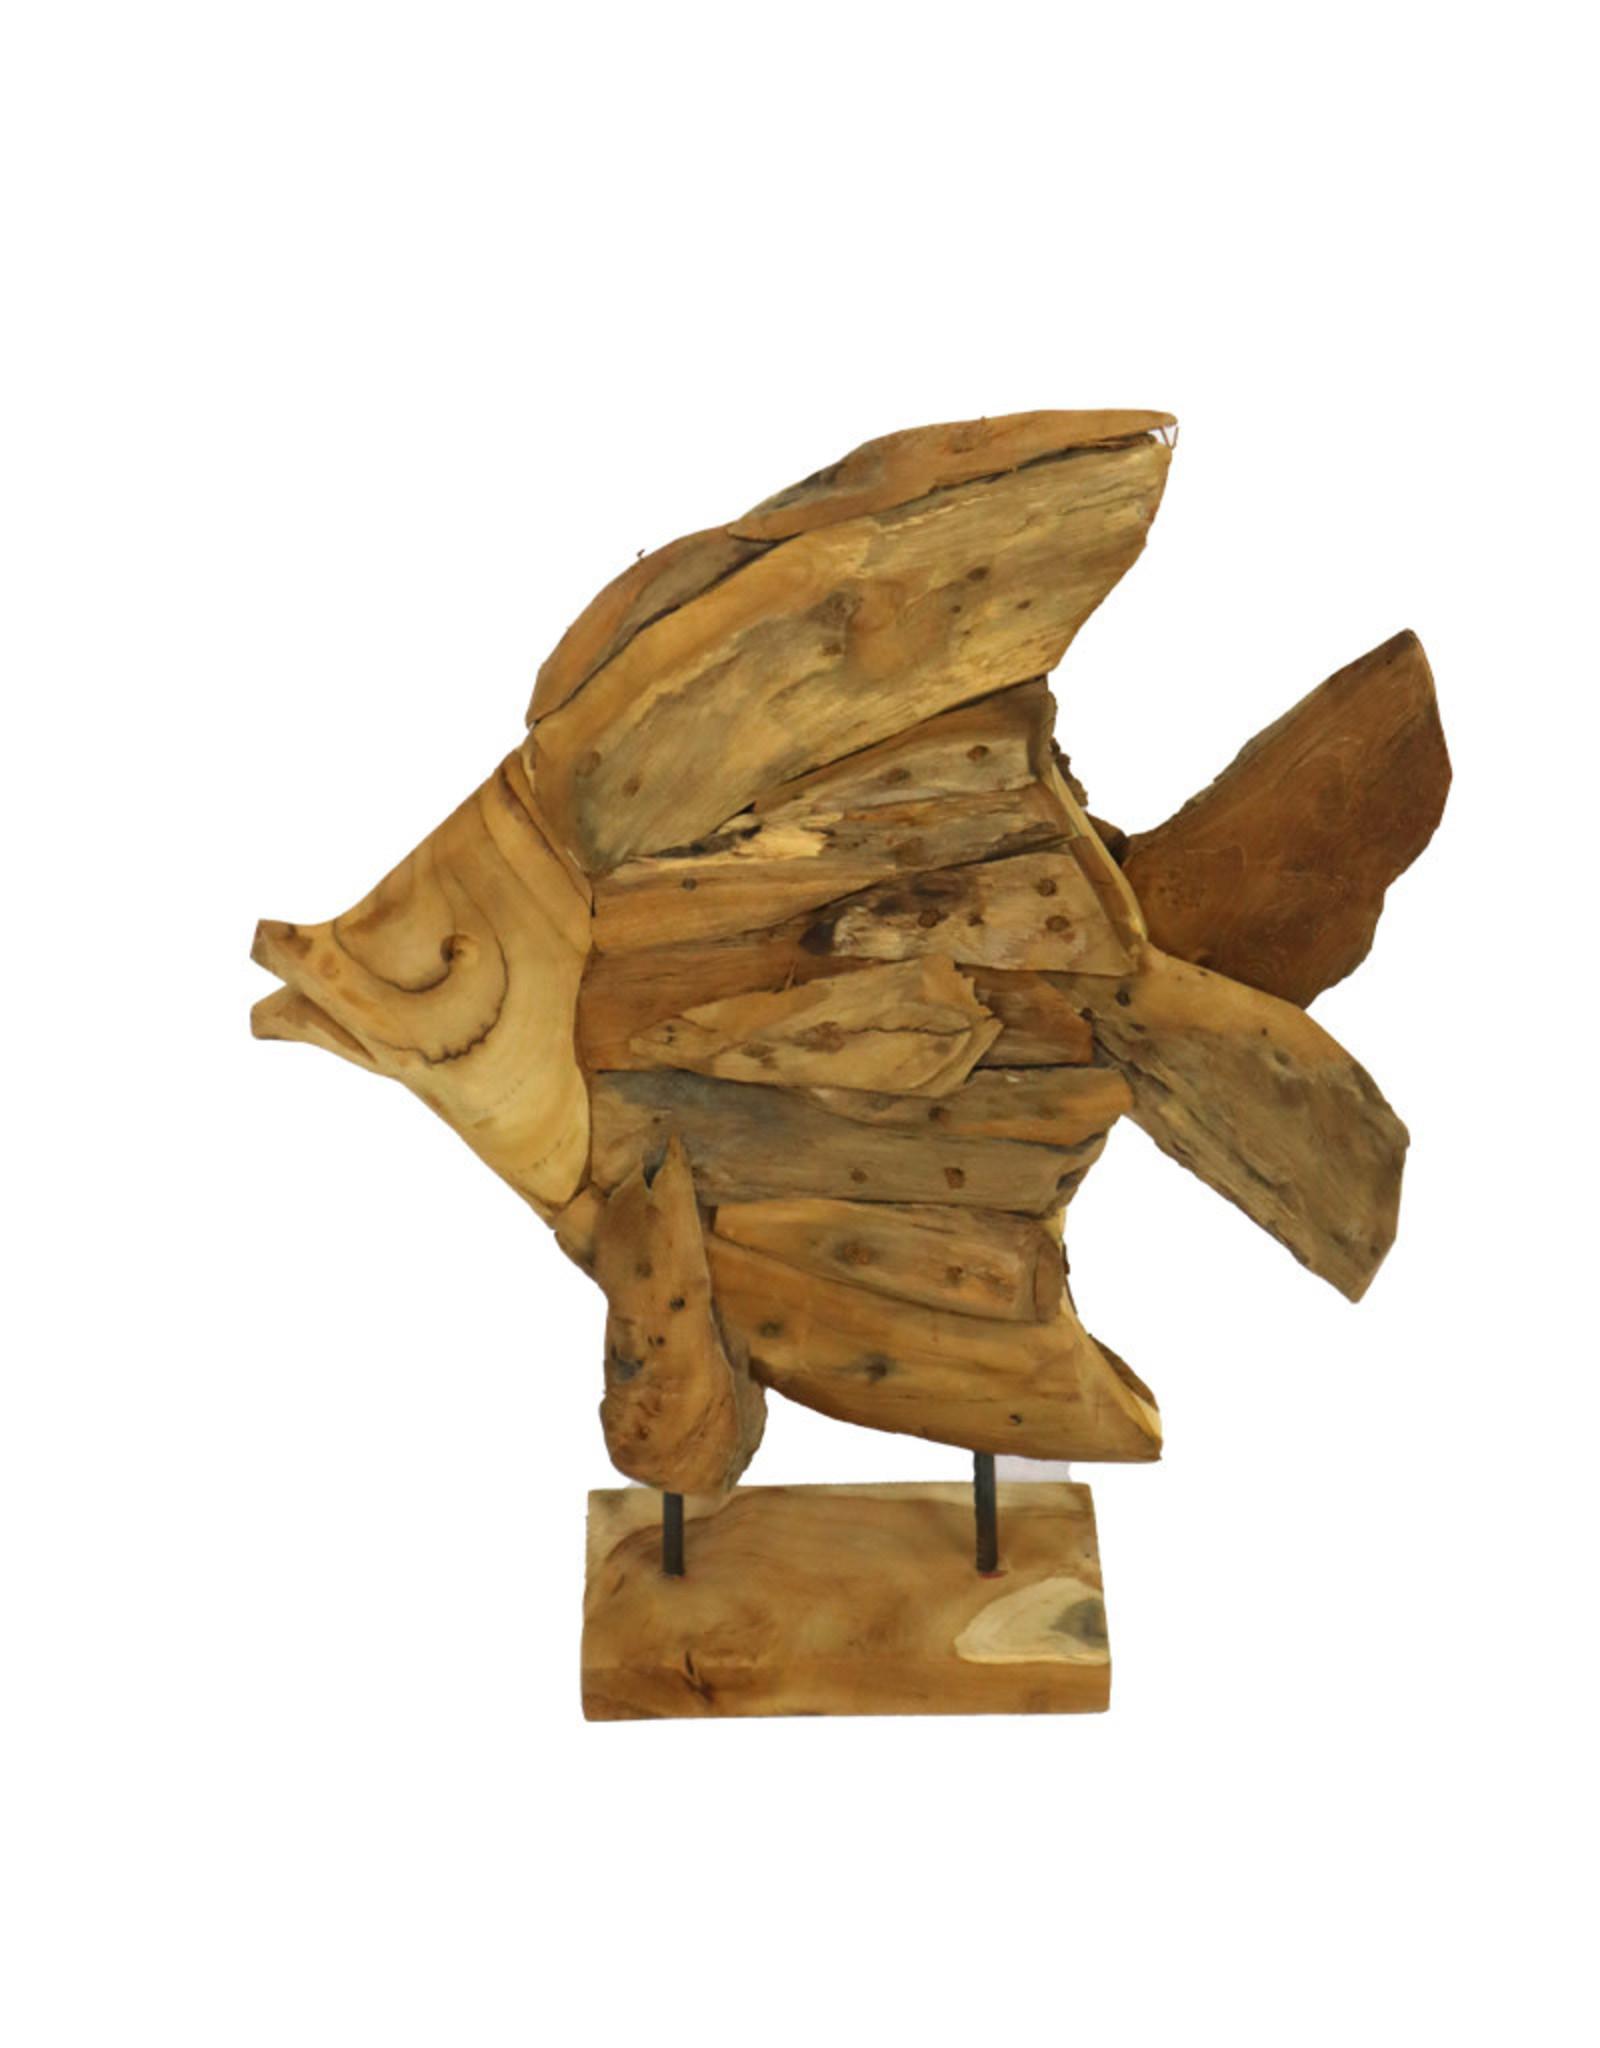 Dijk Fish on Stand Teak Driftwood